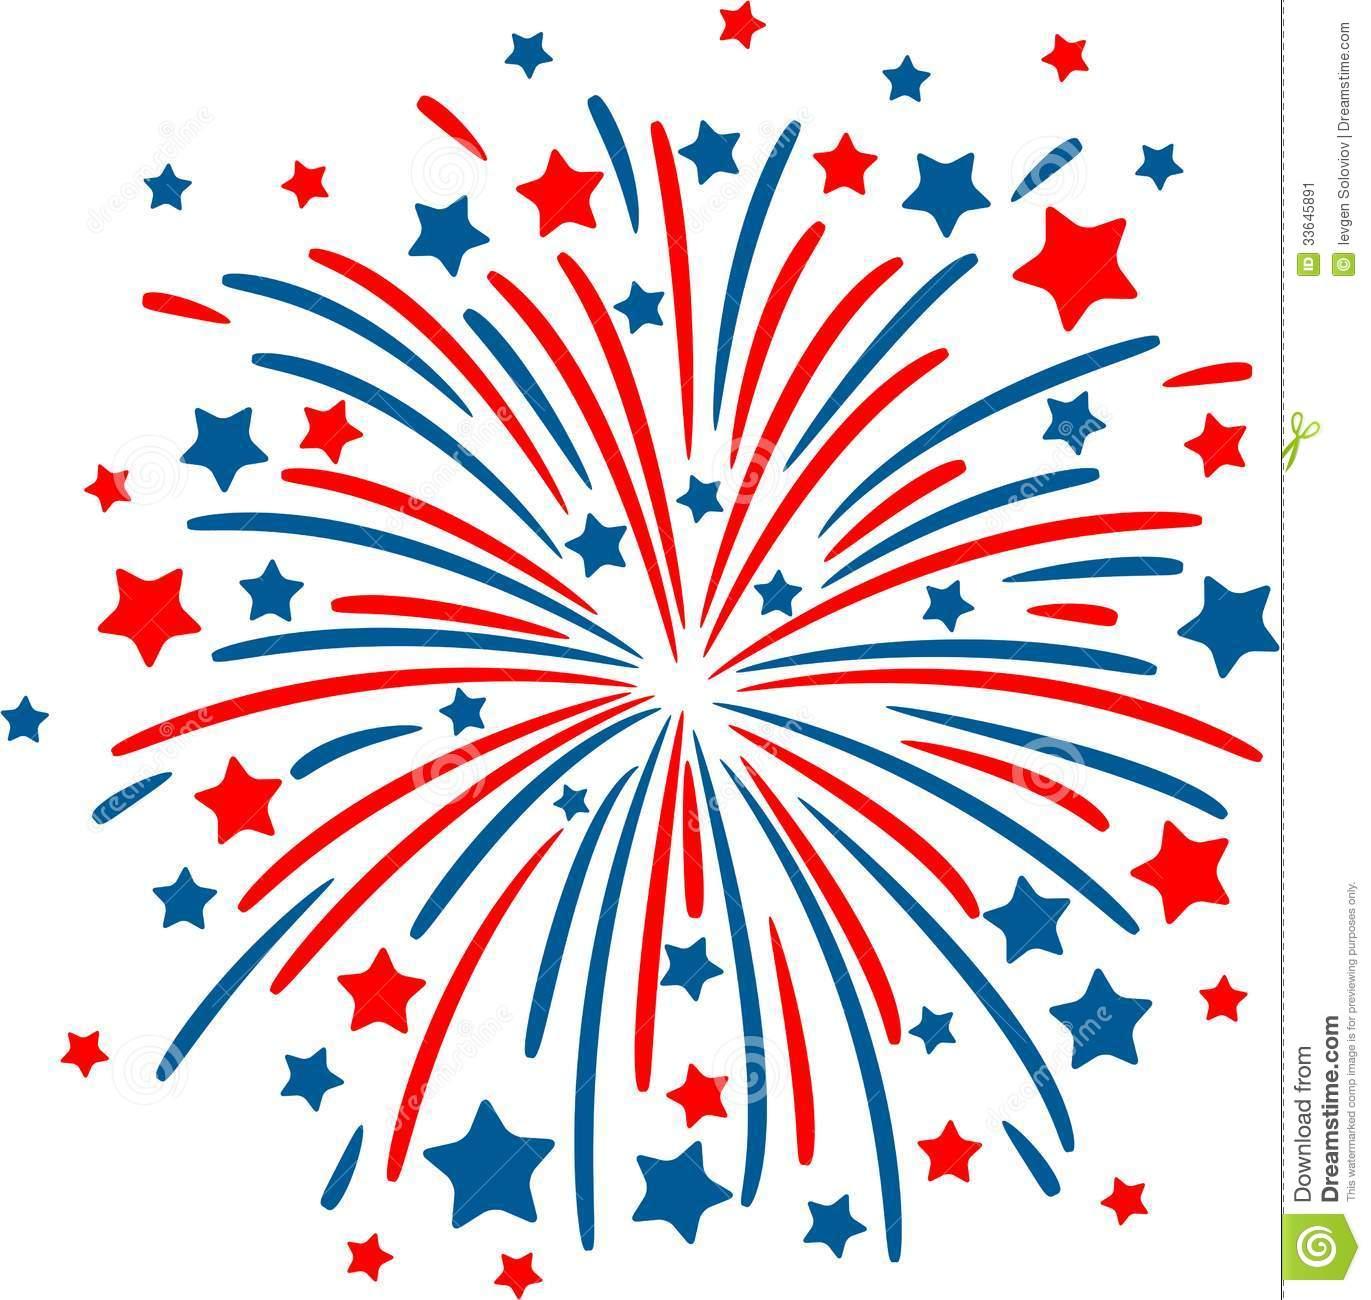 13 Clear Transparent Fireworks Vector Art Images